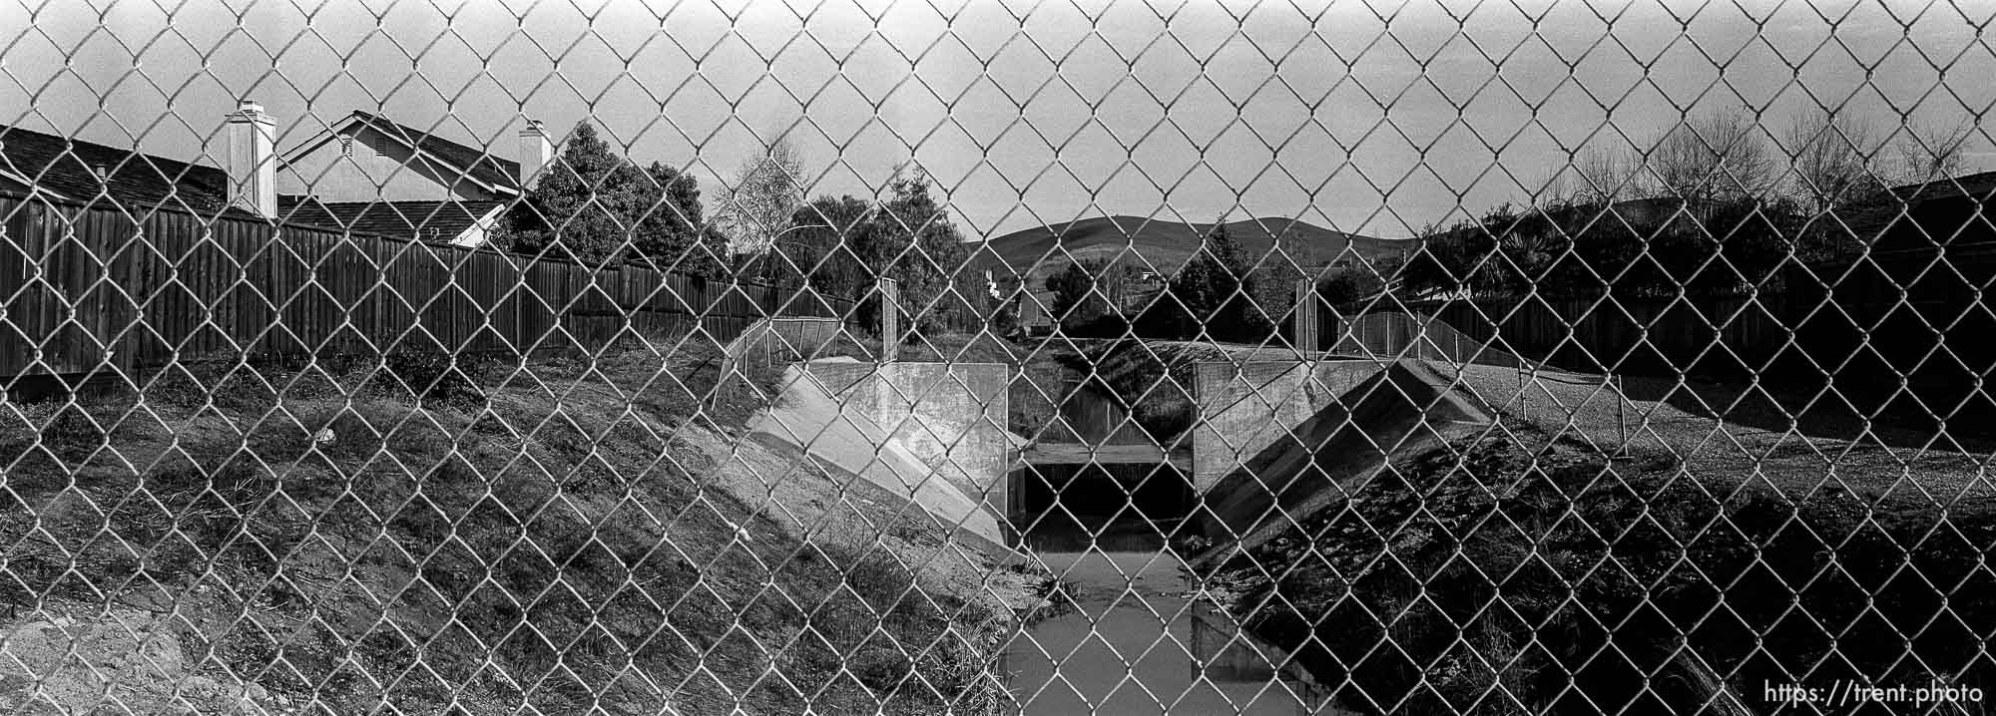 View of San Ramon Creek. through chain-link fence